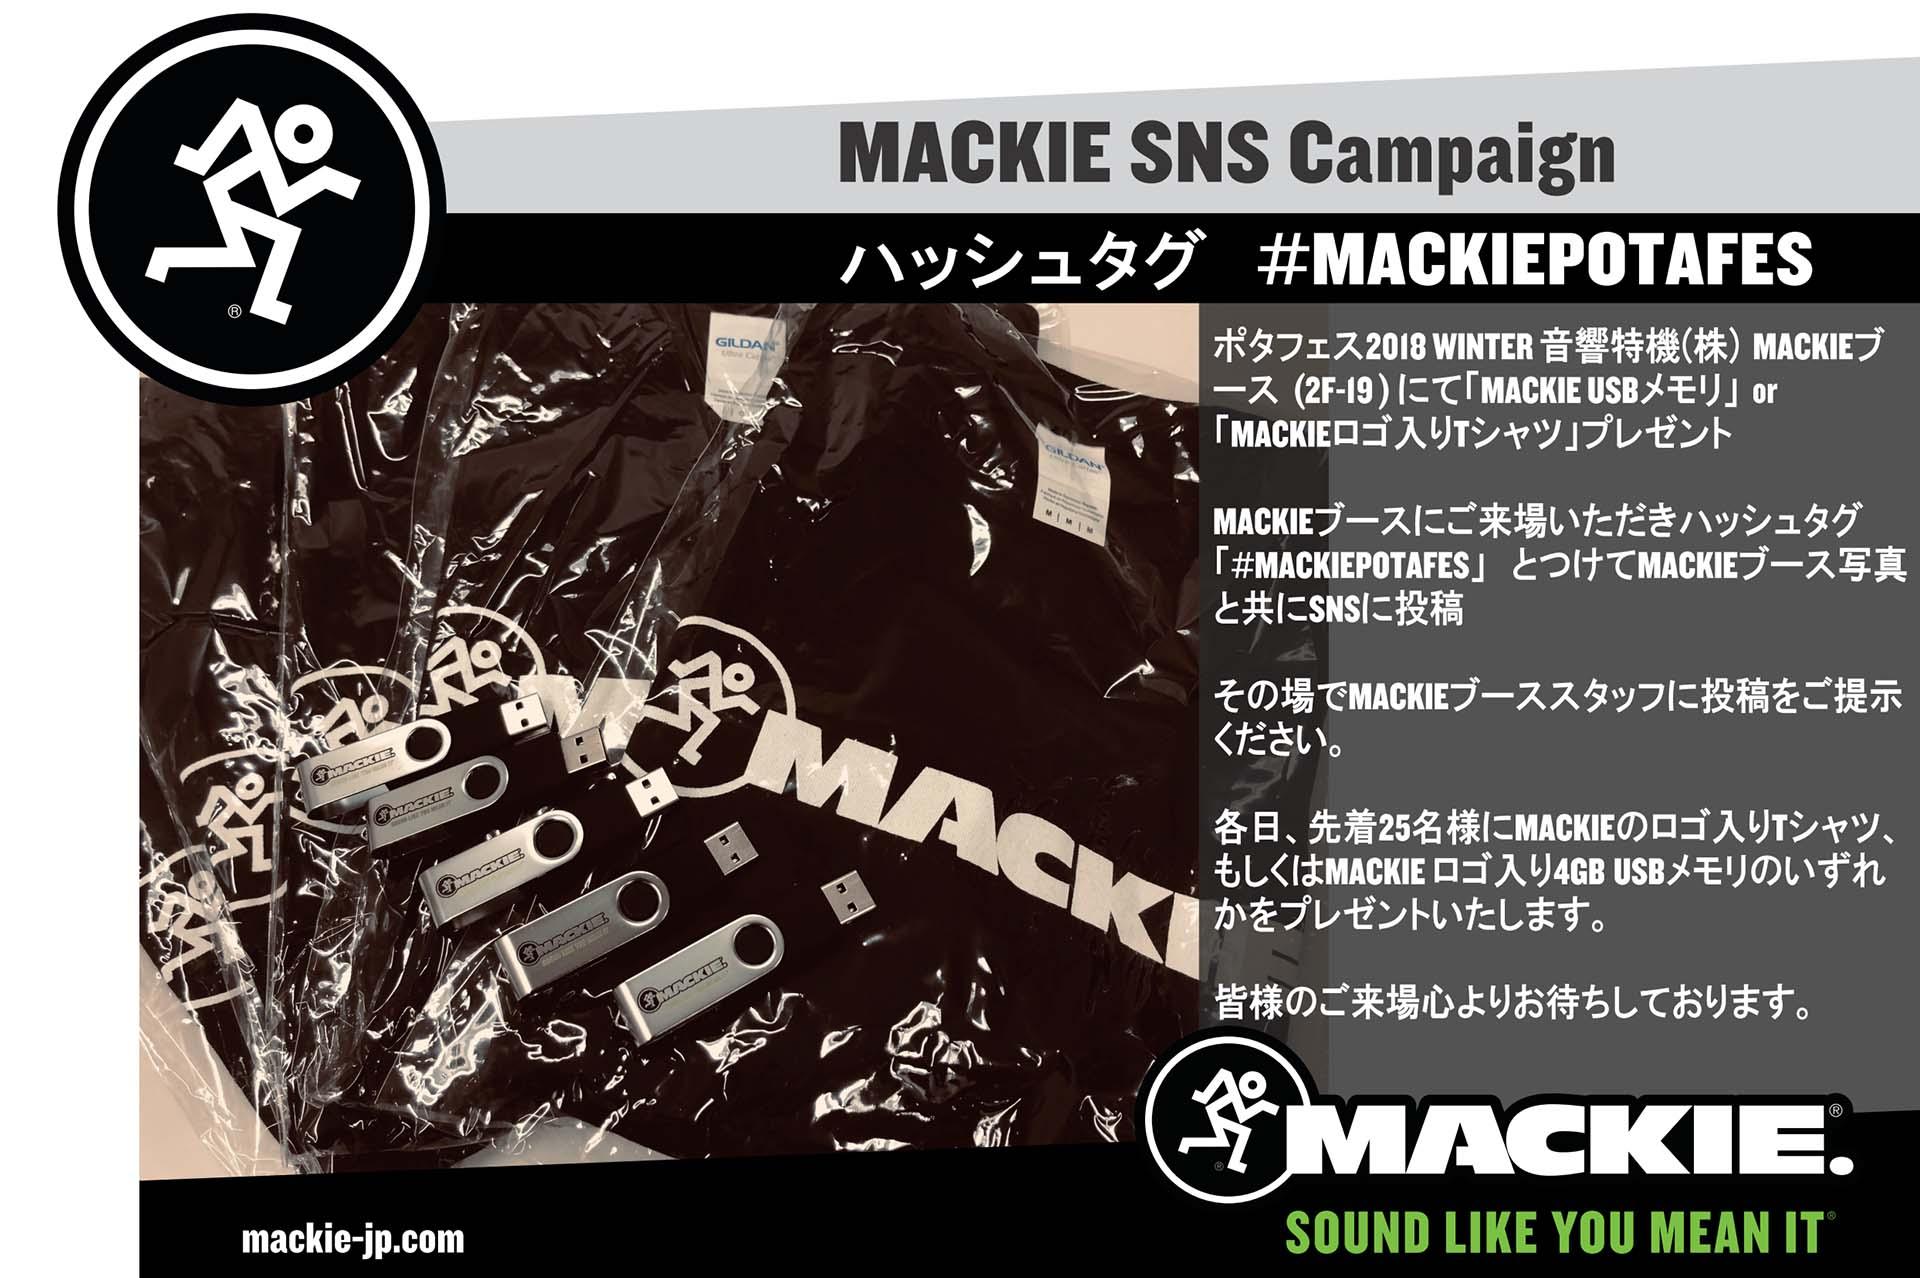 【MACKIE】ポタフェス2018 WINTER MACKIEブース SNSキャンペーン開催